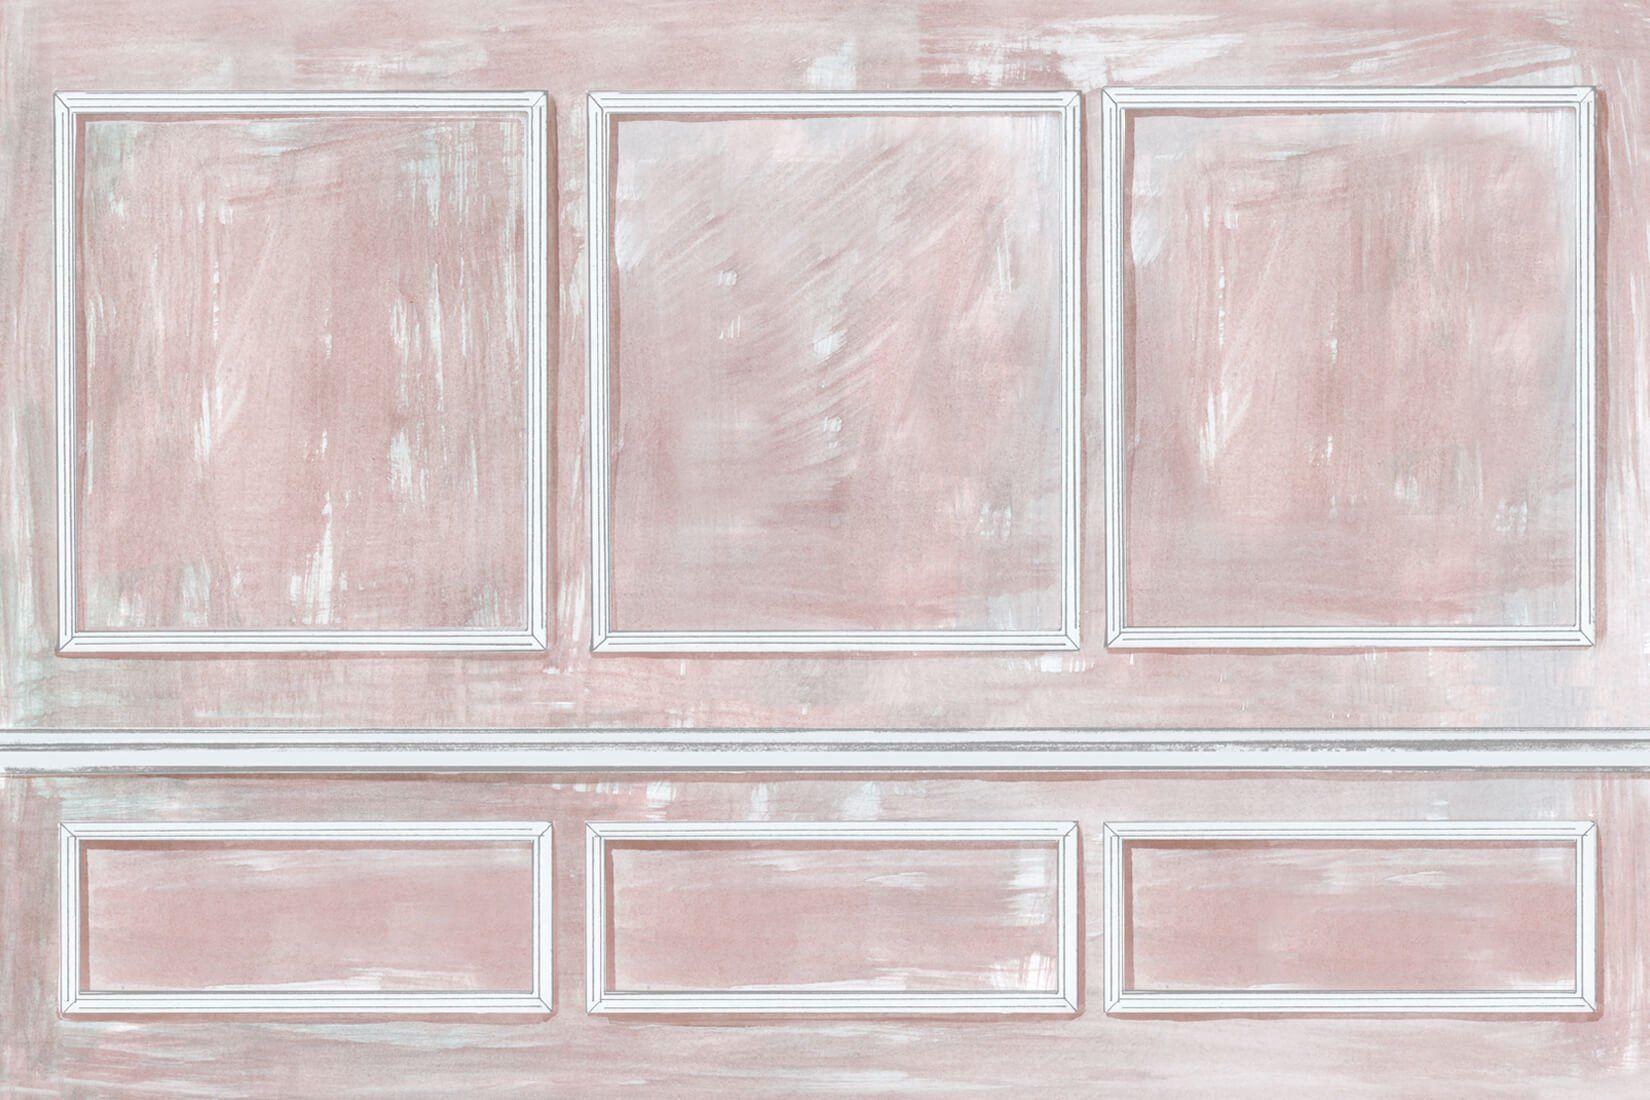 Coral Painted Panels Wall Mural Painted paneling walls